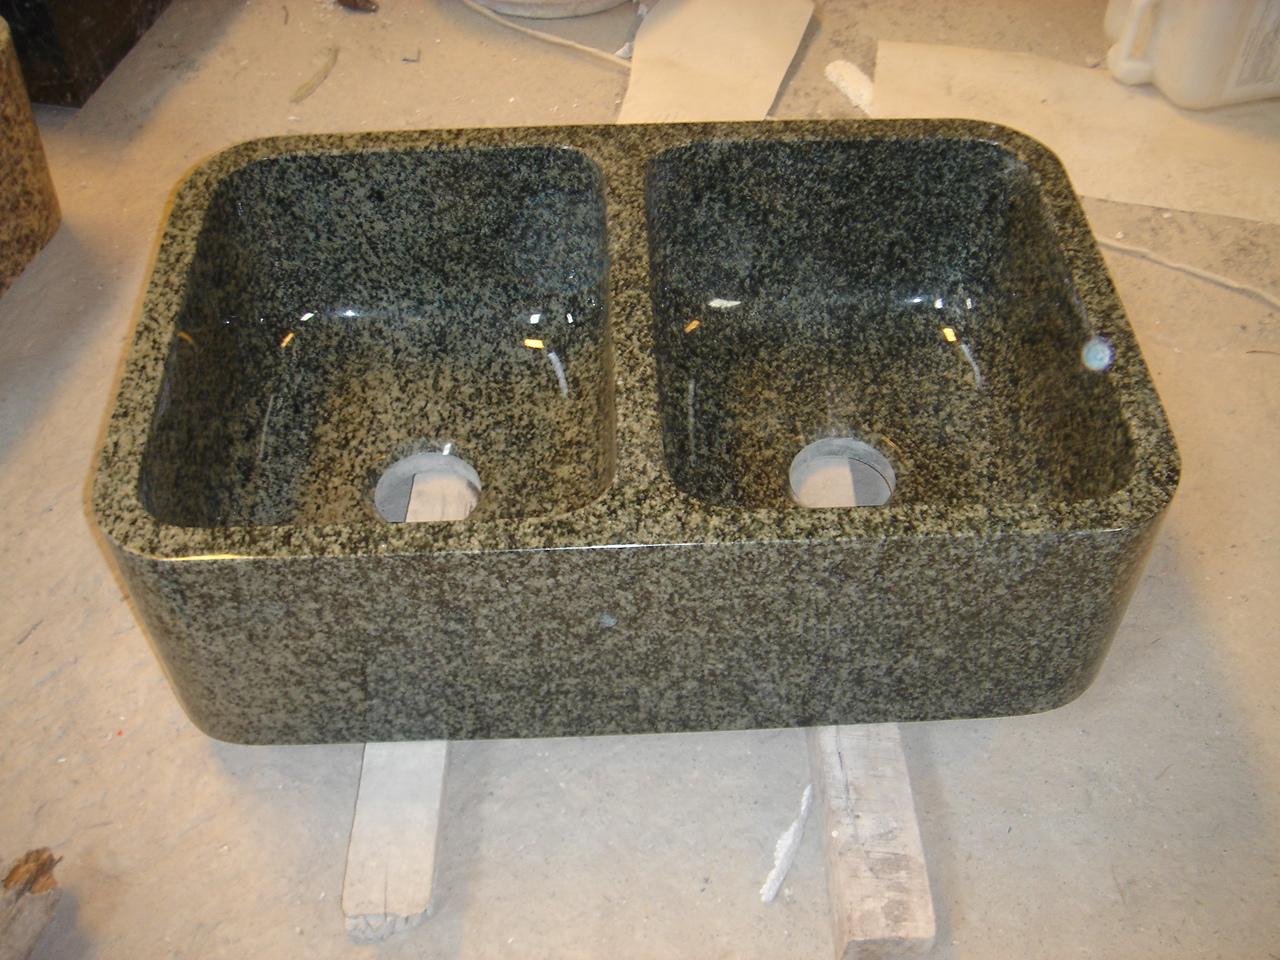 Stone Sinks Uk : Stone Tiles, Fireplaces, Granite Worktops, Table Tops, Shropshire ...